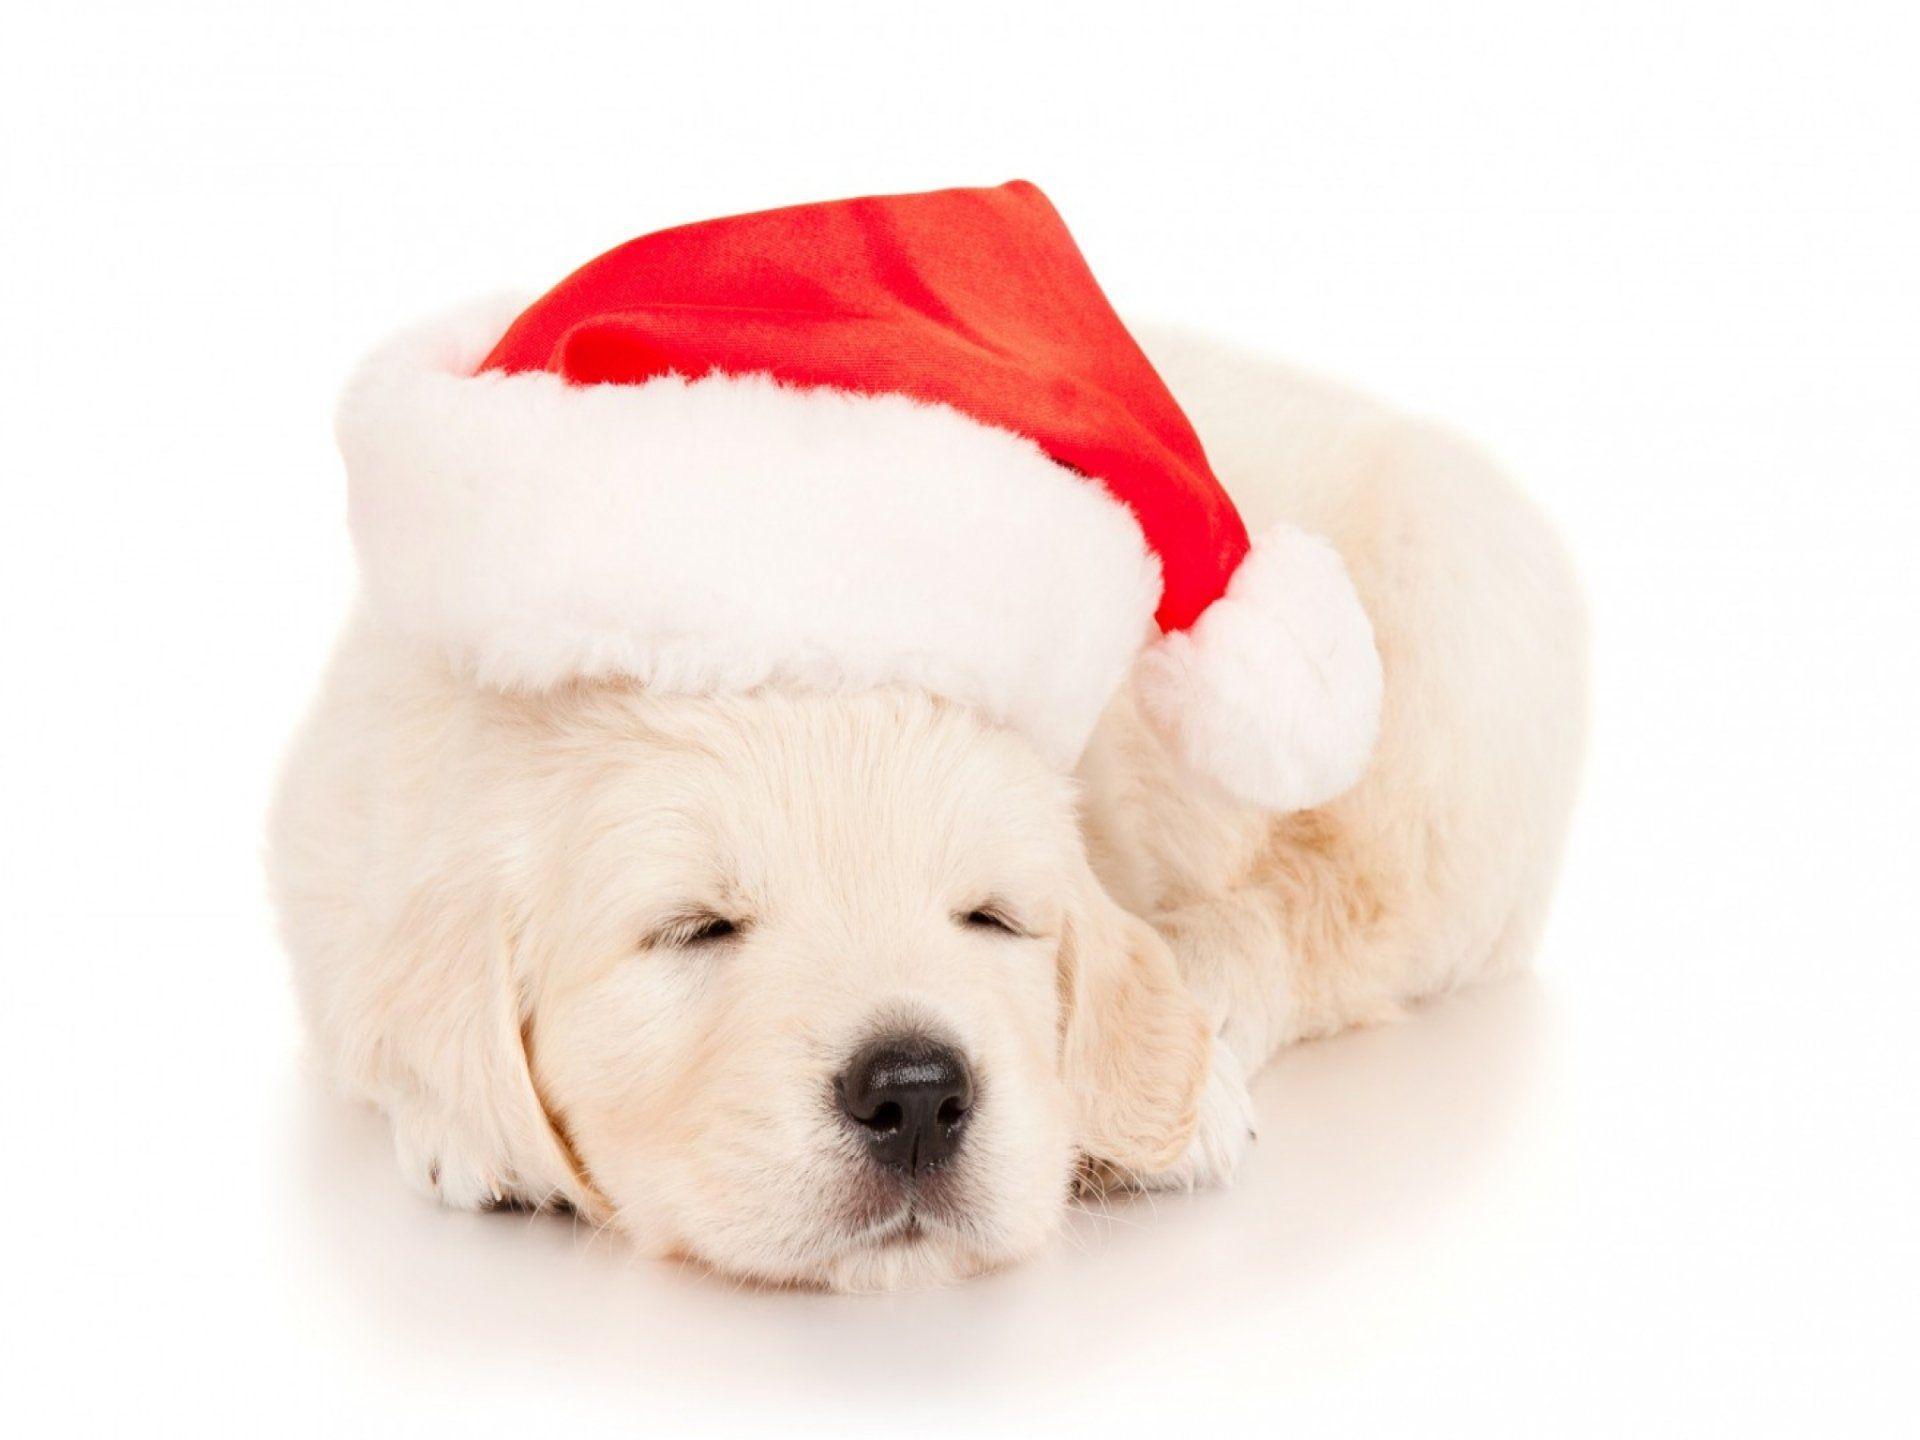 Animal Puppy Labrador Retriever Animal Sleeping Cute Christmas Santa Hat Wallpaper Golden Retriever Puppy Christmas Puppy Cute Puppies